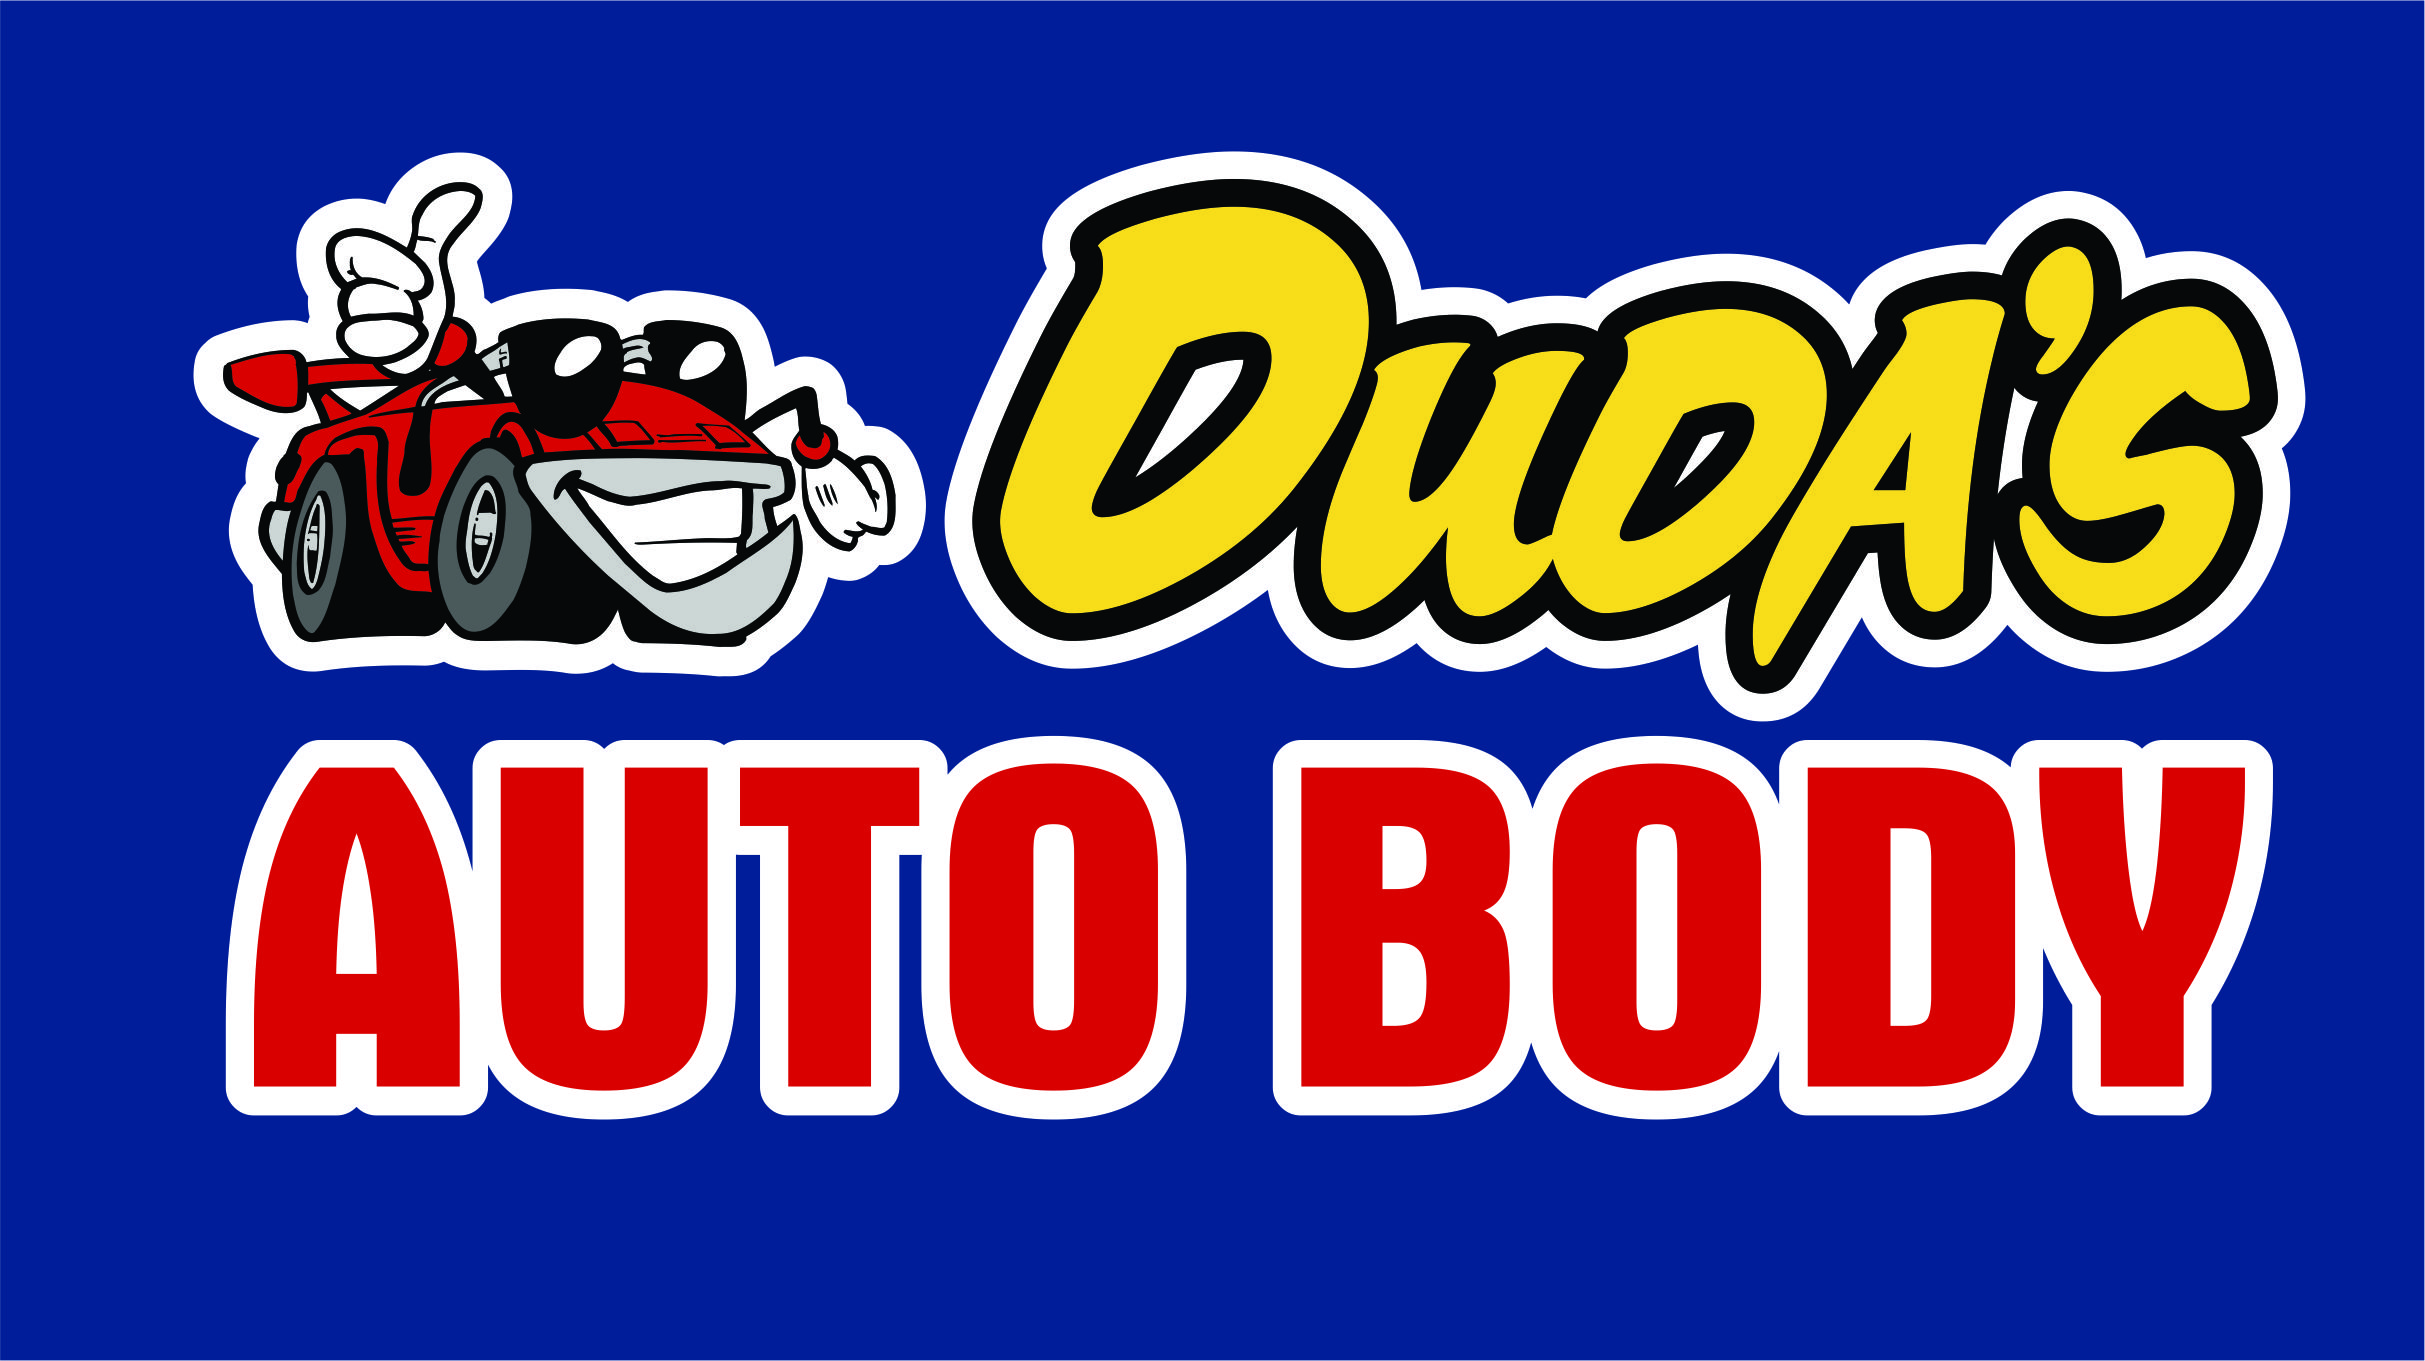 Duda's Auto Body & Auto Sales, Sykesville PA